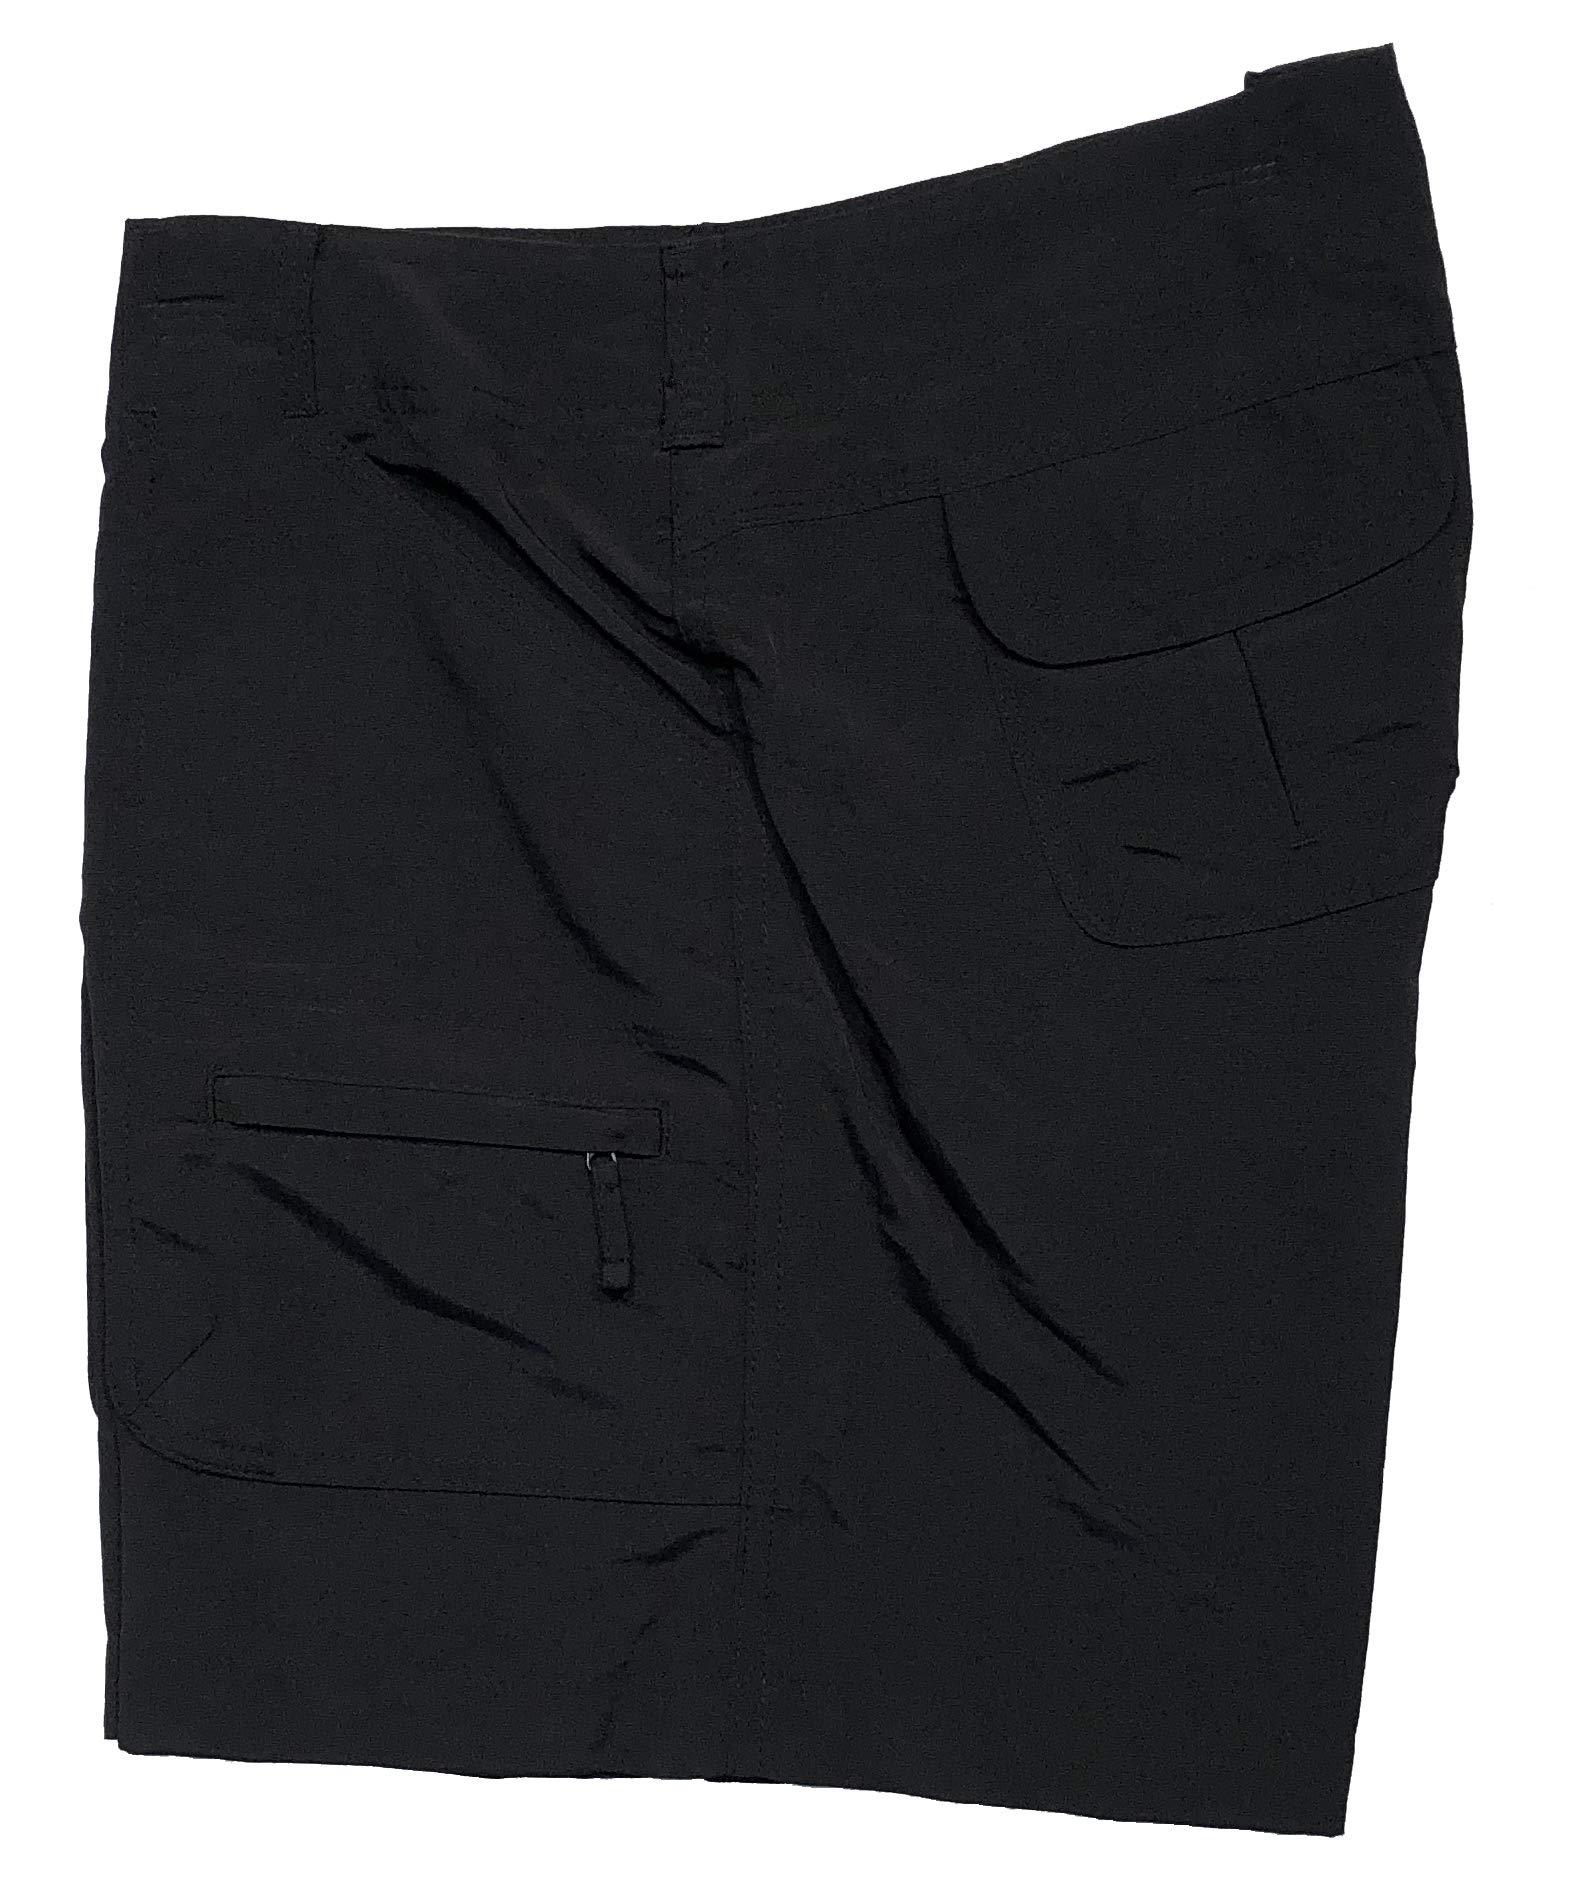 Bimini Bay Outfitters Women's Challenger II Short (Black, 12) by Bimini Bay Outfitters